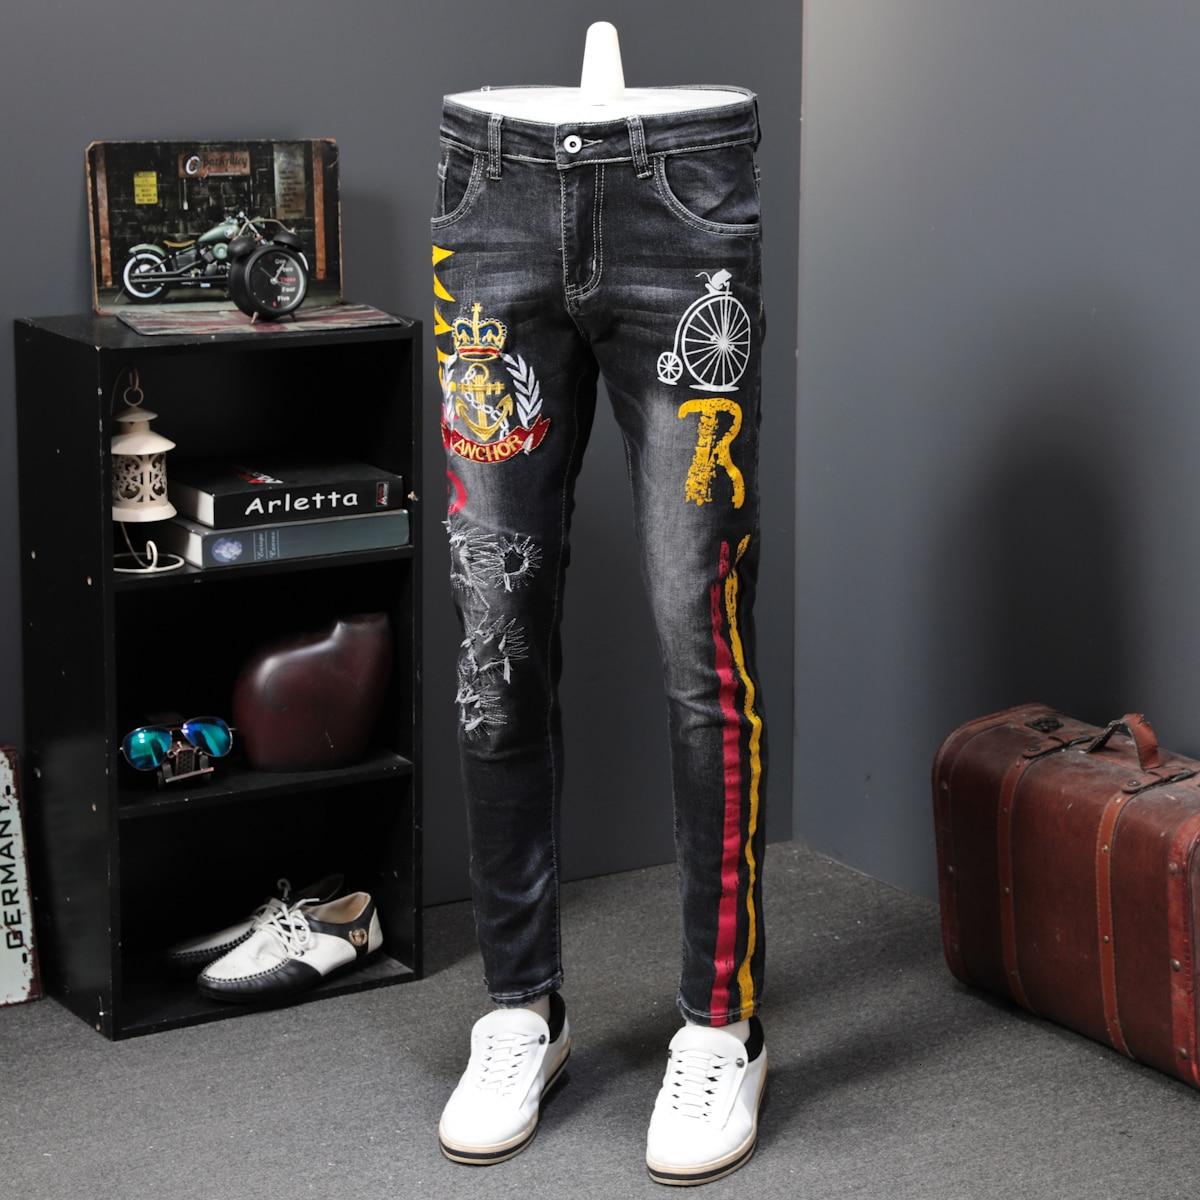 Autumn Men Elastic Long Trousers Fashion Print Jeans Male Colored Drawing Painted Slim Denim Pants Designer Jeans Printing Jeans